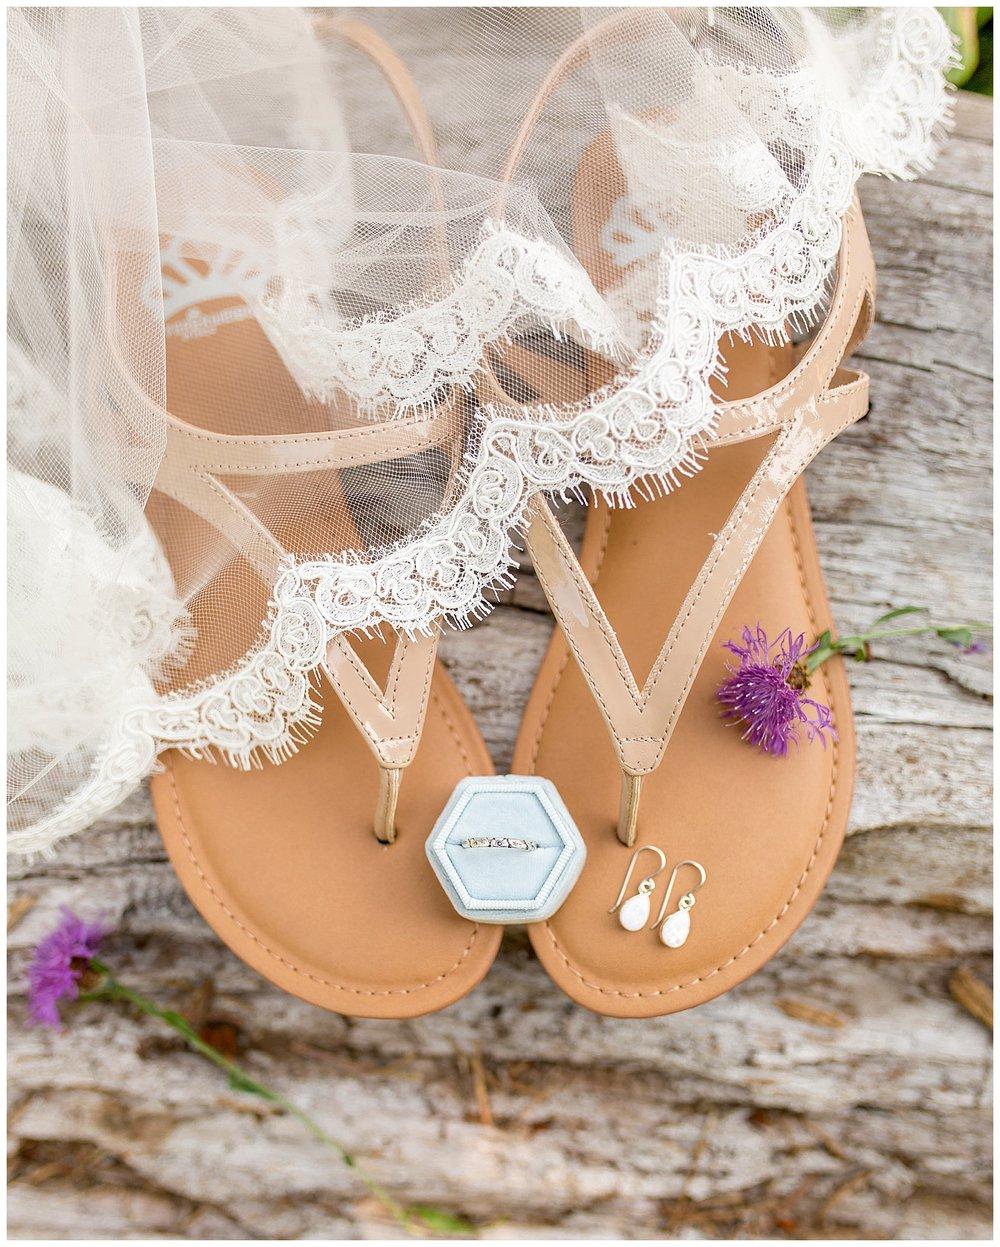 Wedding_Easton_Washington_Whistling_Dixie_Photography_Summer_River_Cabin_0007.jpg